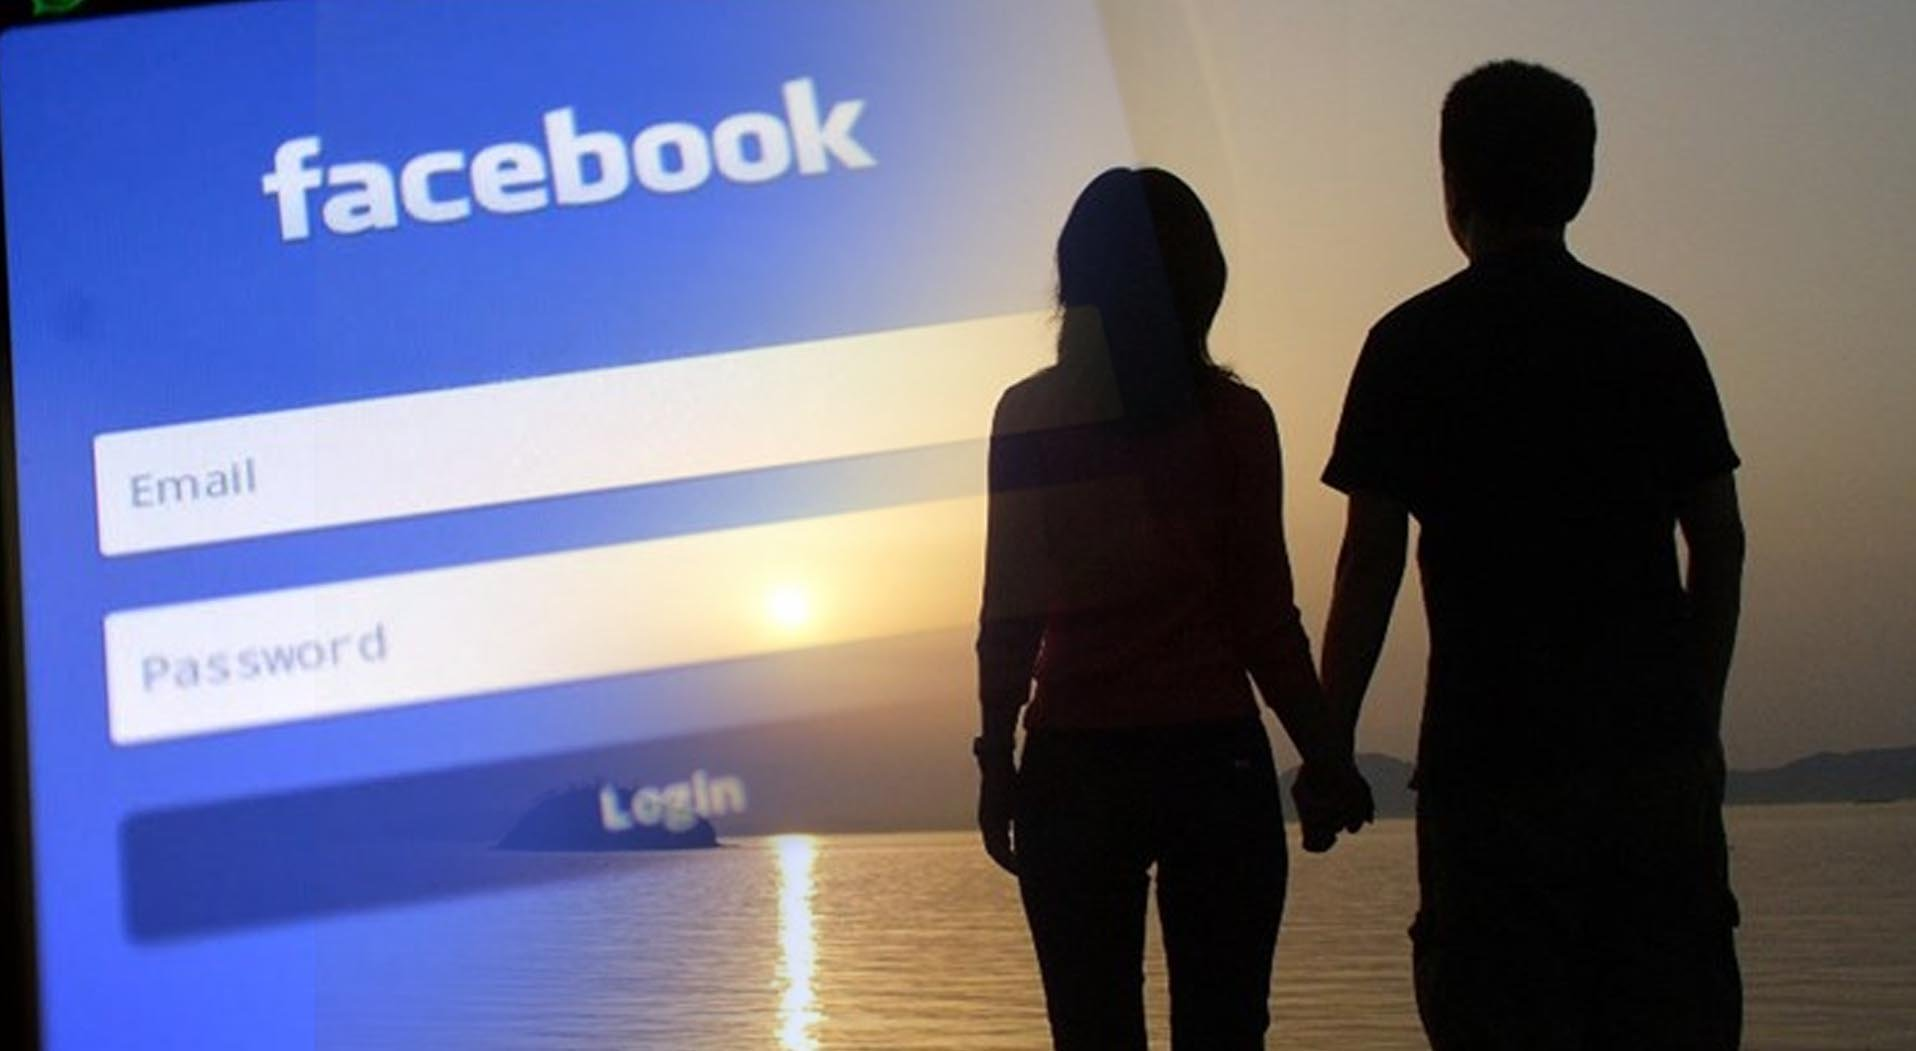 facebook thu nghiem tinh nang tim nguoi hen ho qua mang